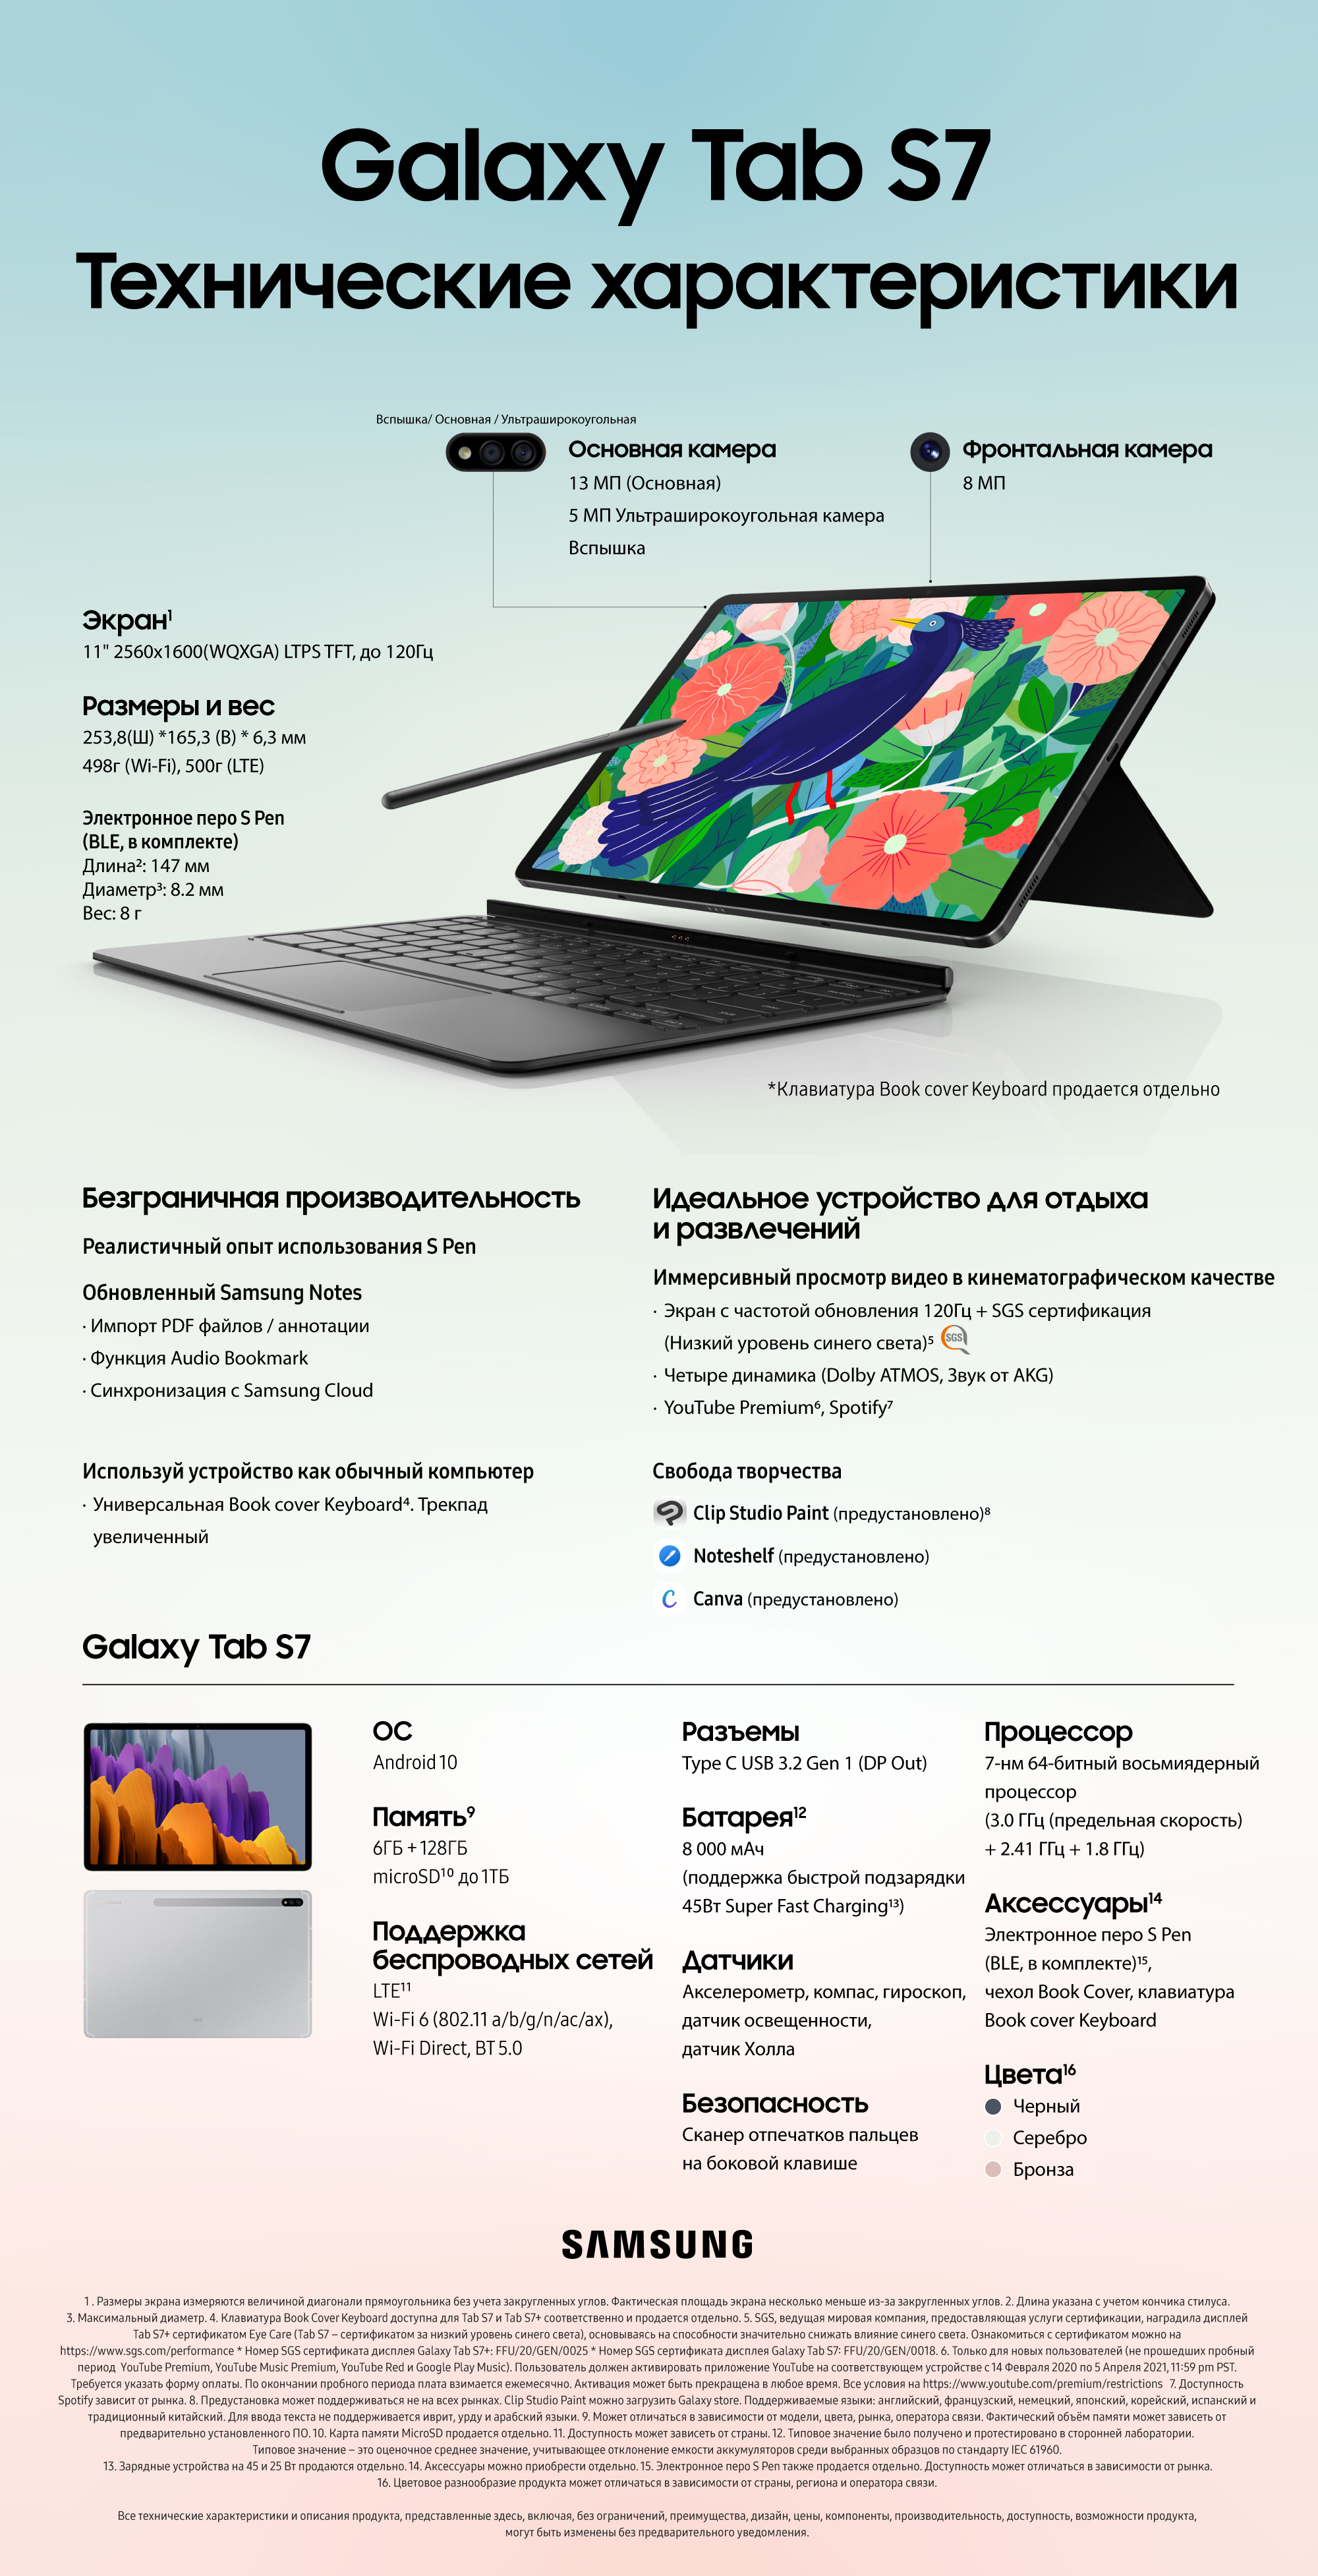 [Инфографика]: Технические характеристики Galaxy Tab S7 | S7+